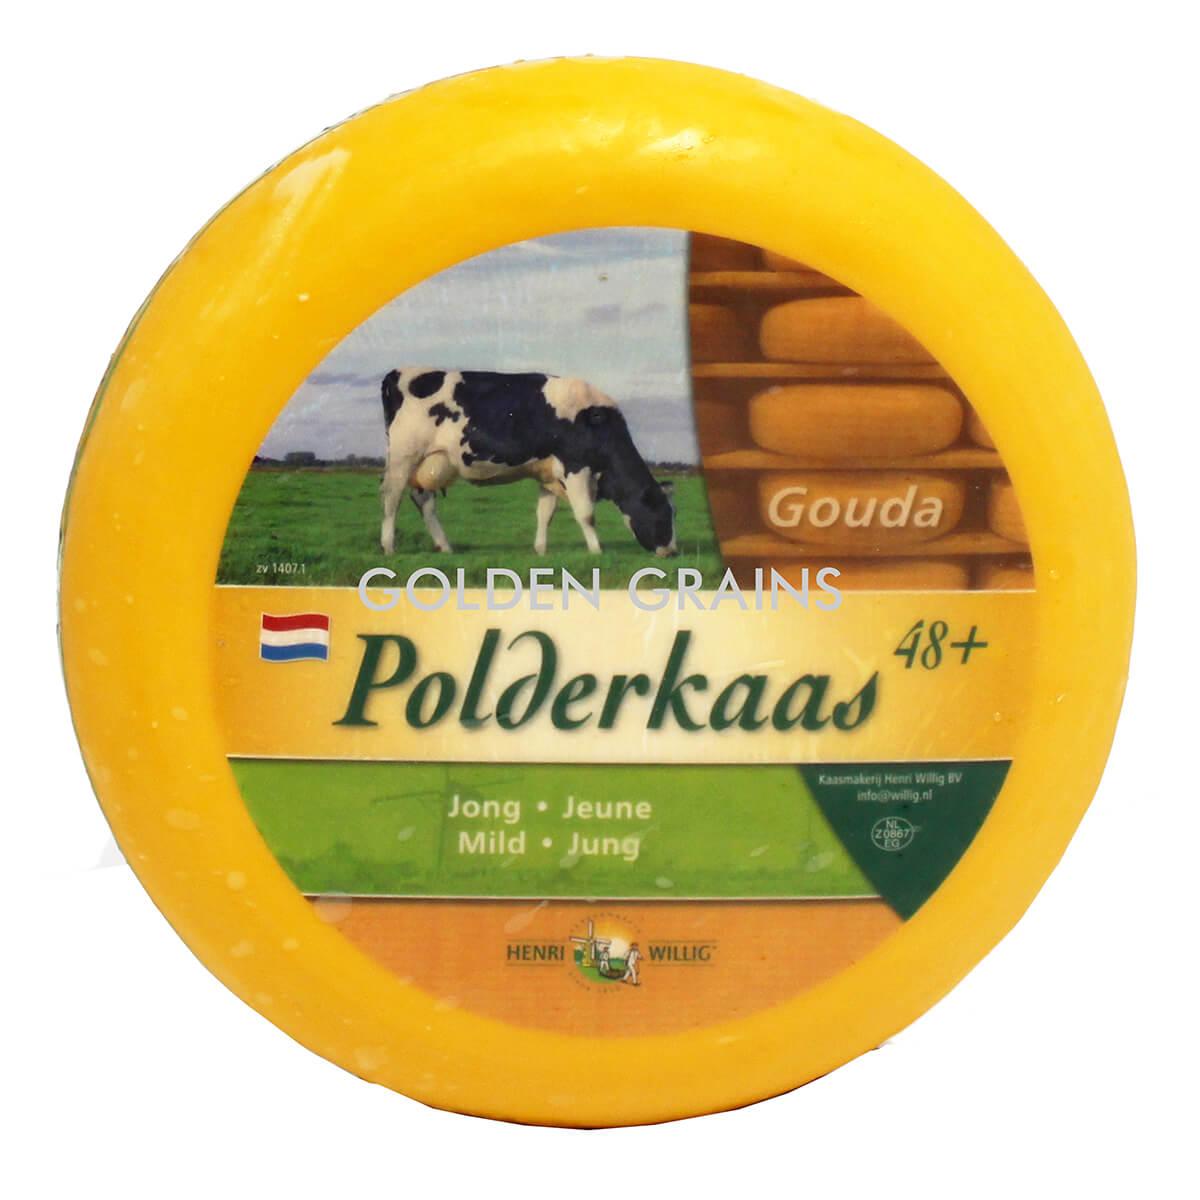 Polderkaas Gouda Cheese